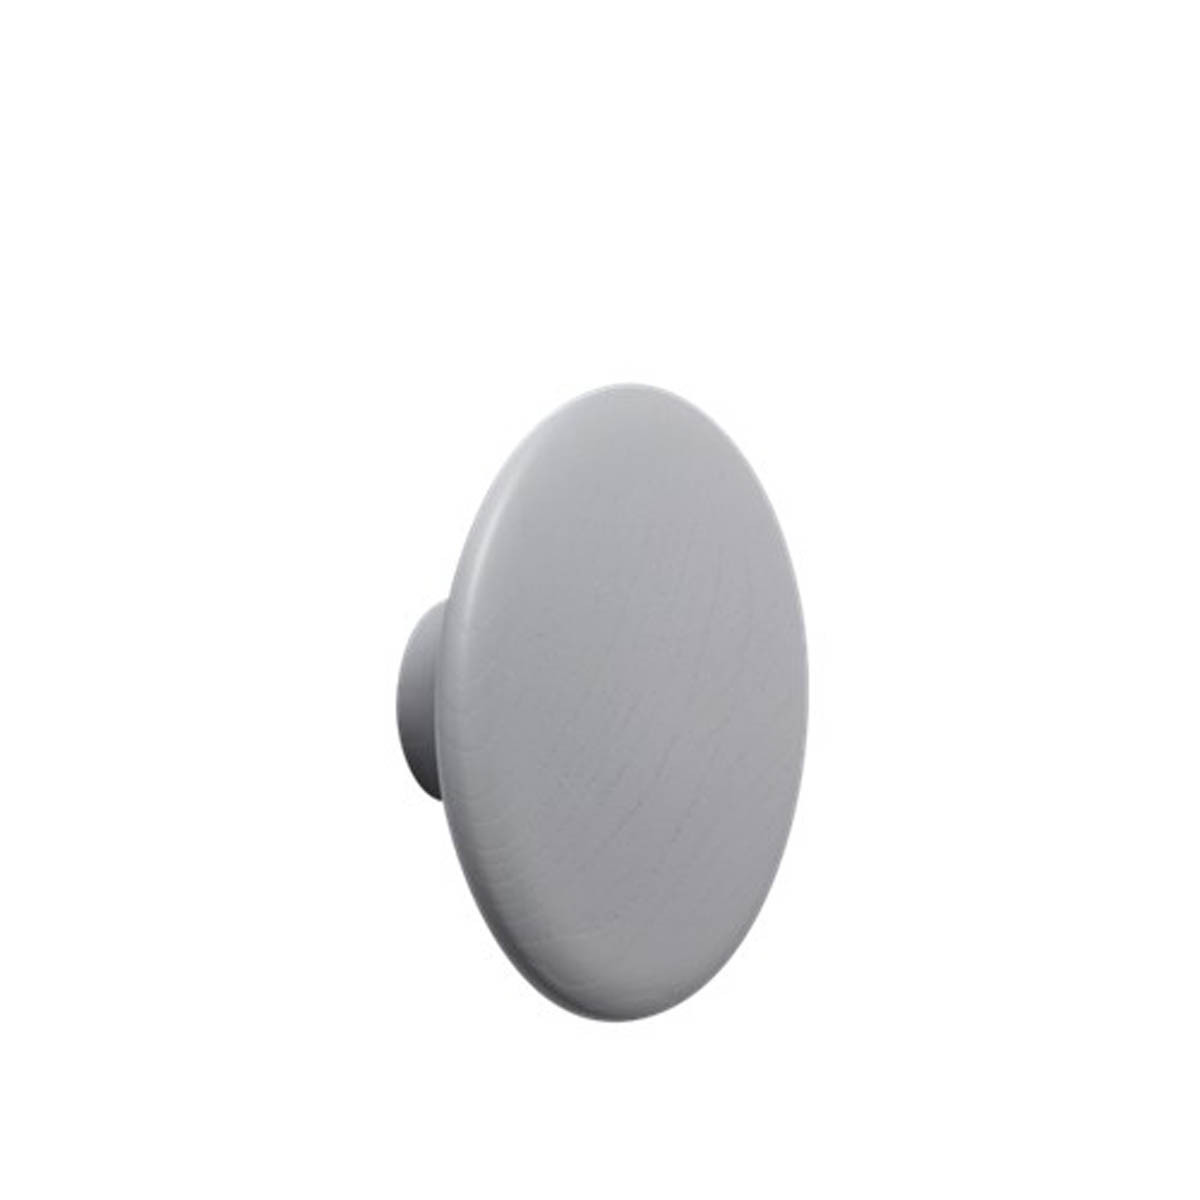 Muuto The Dots 17cm - Large